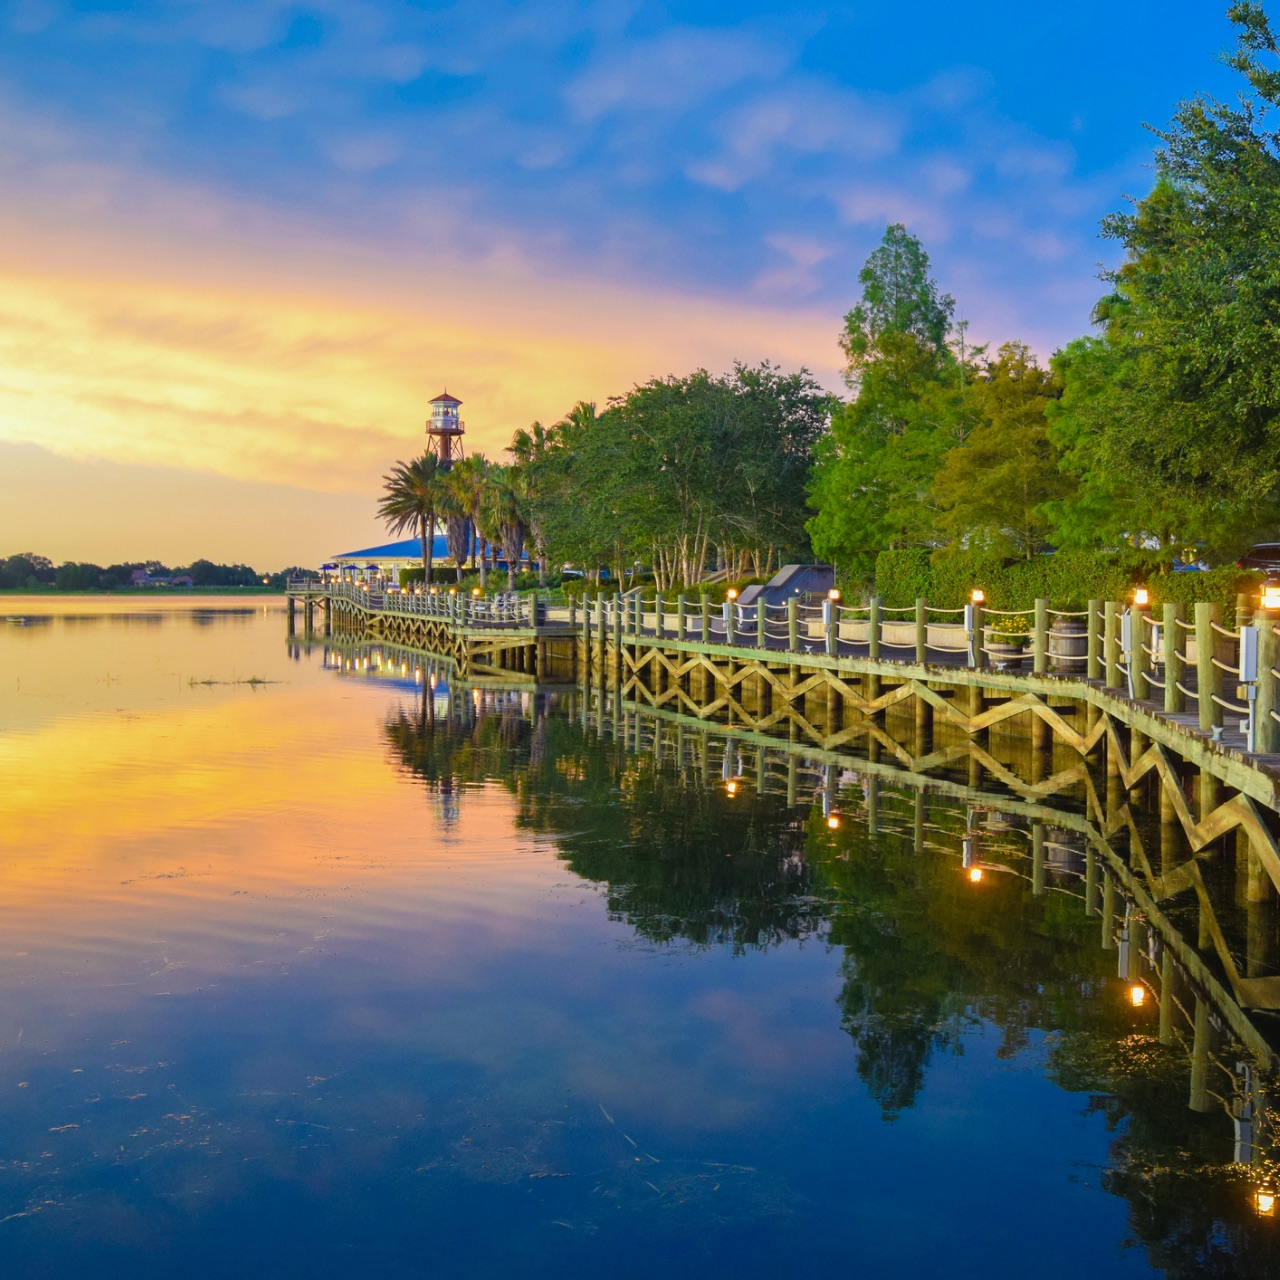 Sunny Orlando, Florida